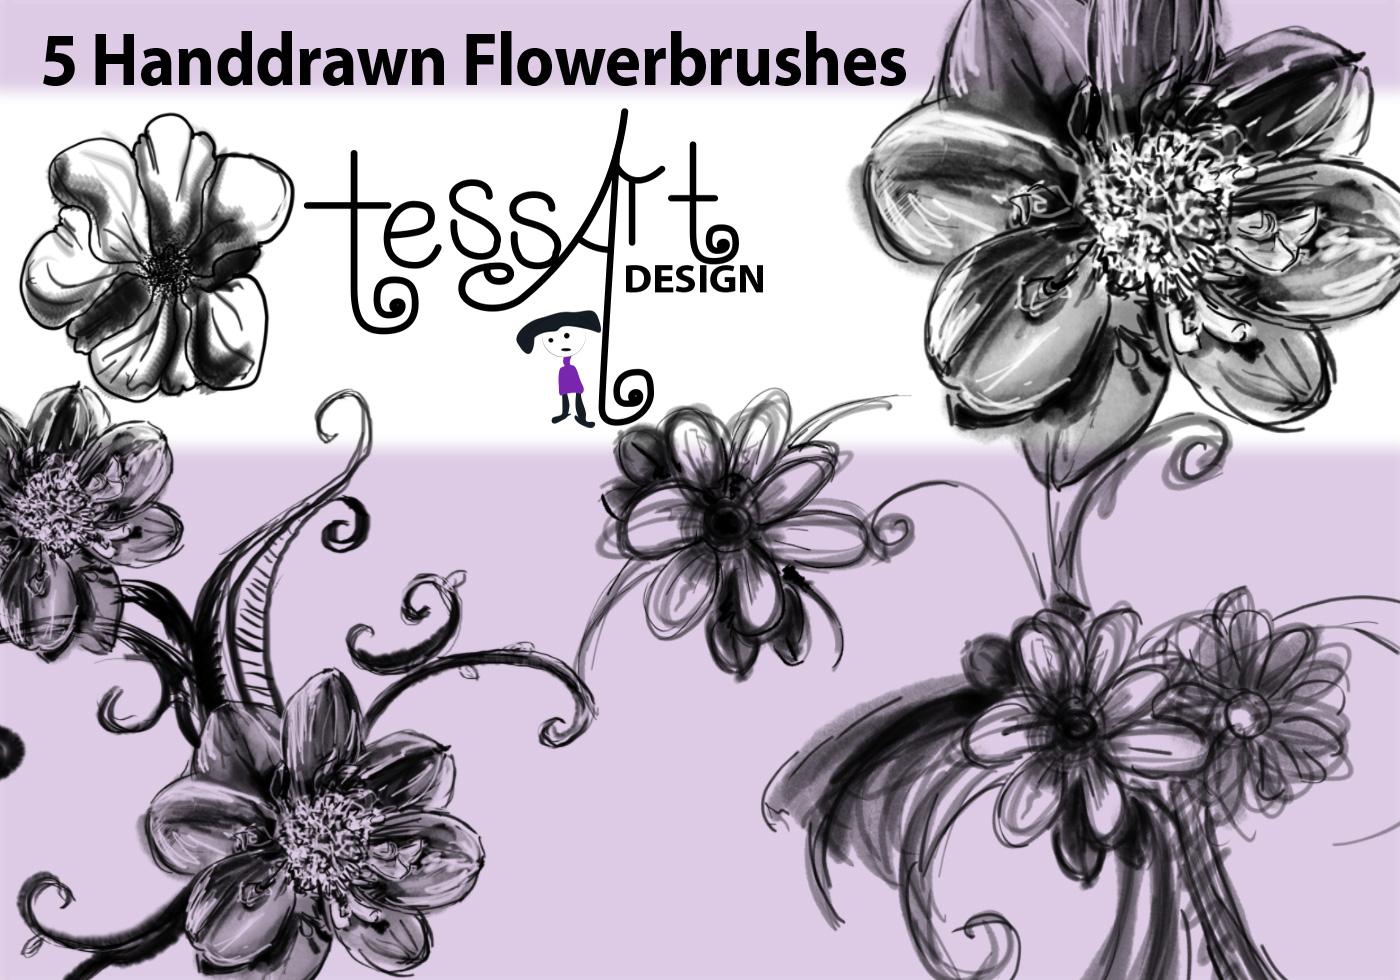 Handdrawn Flowerbrush Free Photoshop Brushes At Brusheezy The Wetbrush Watercolor Mossaics Starburst